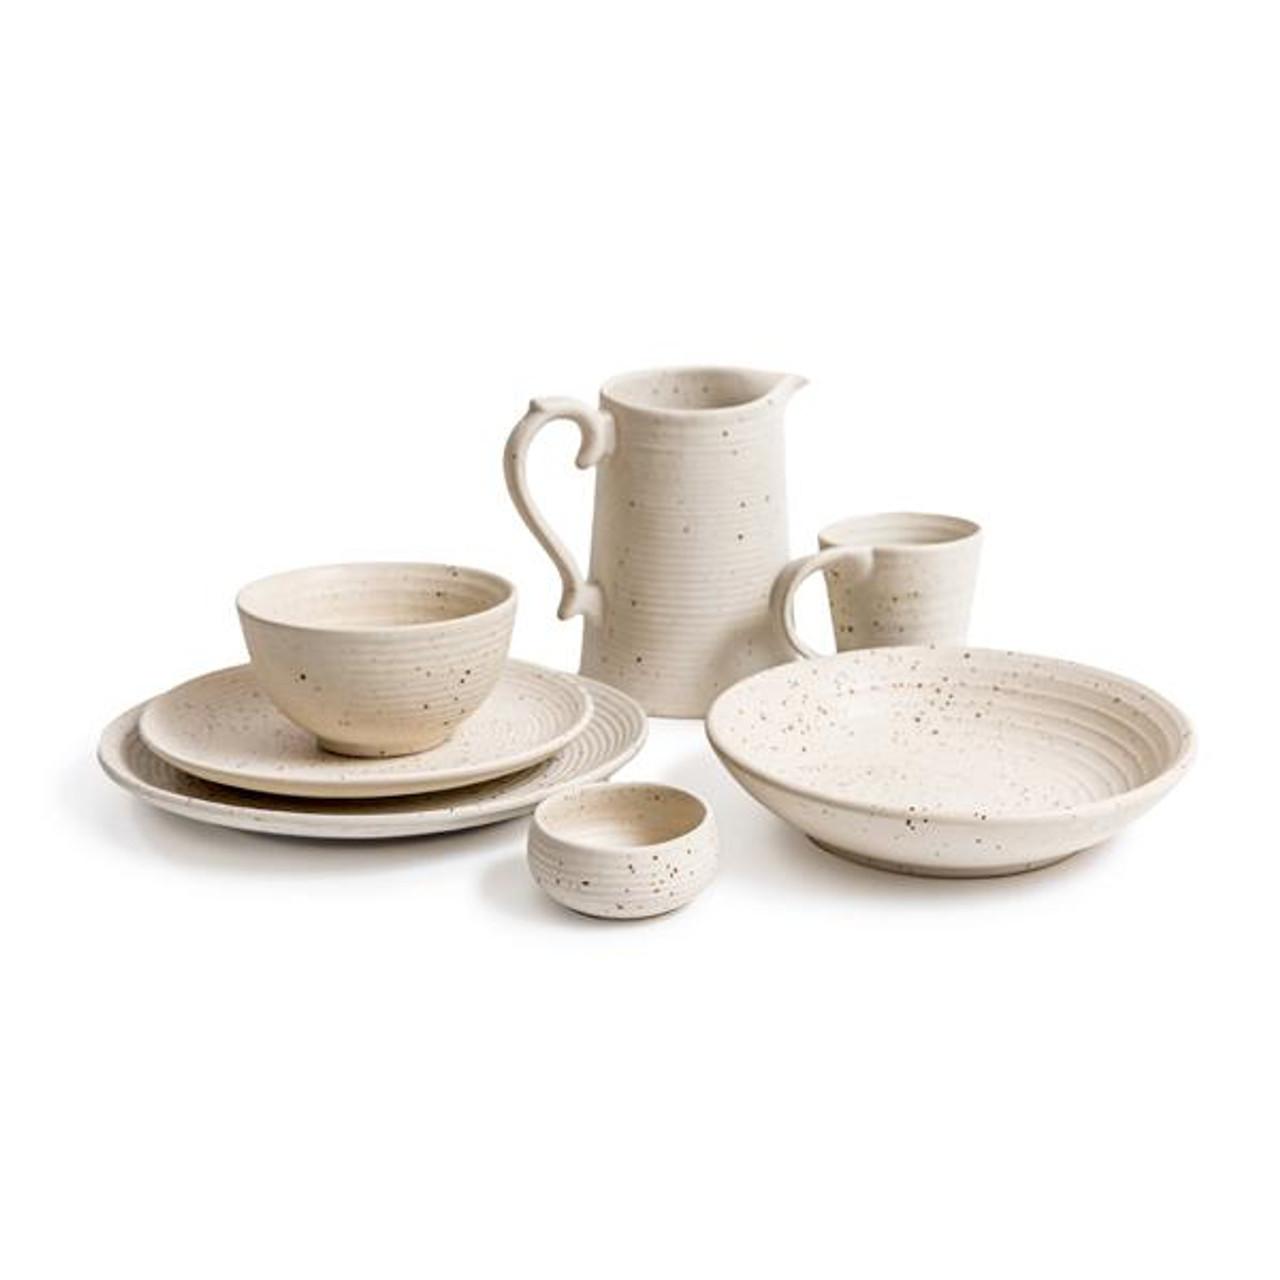 ribbed speckled ceramics